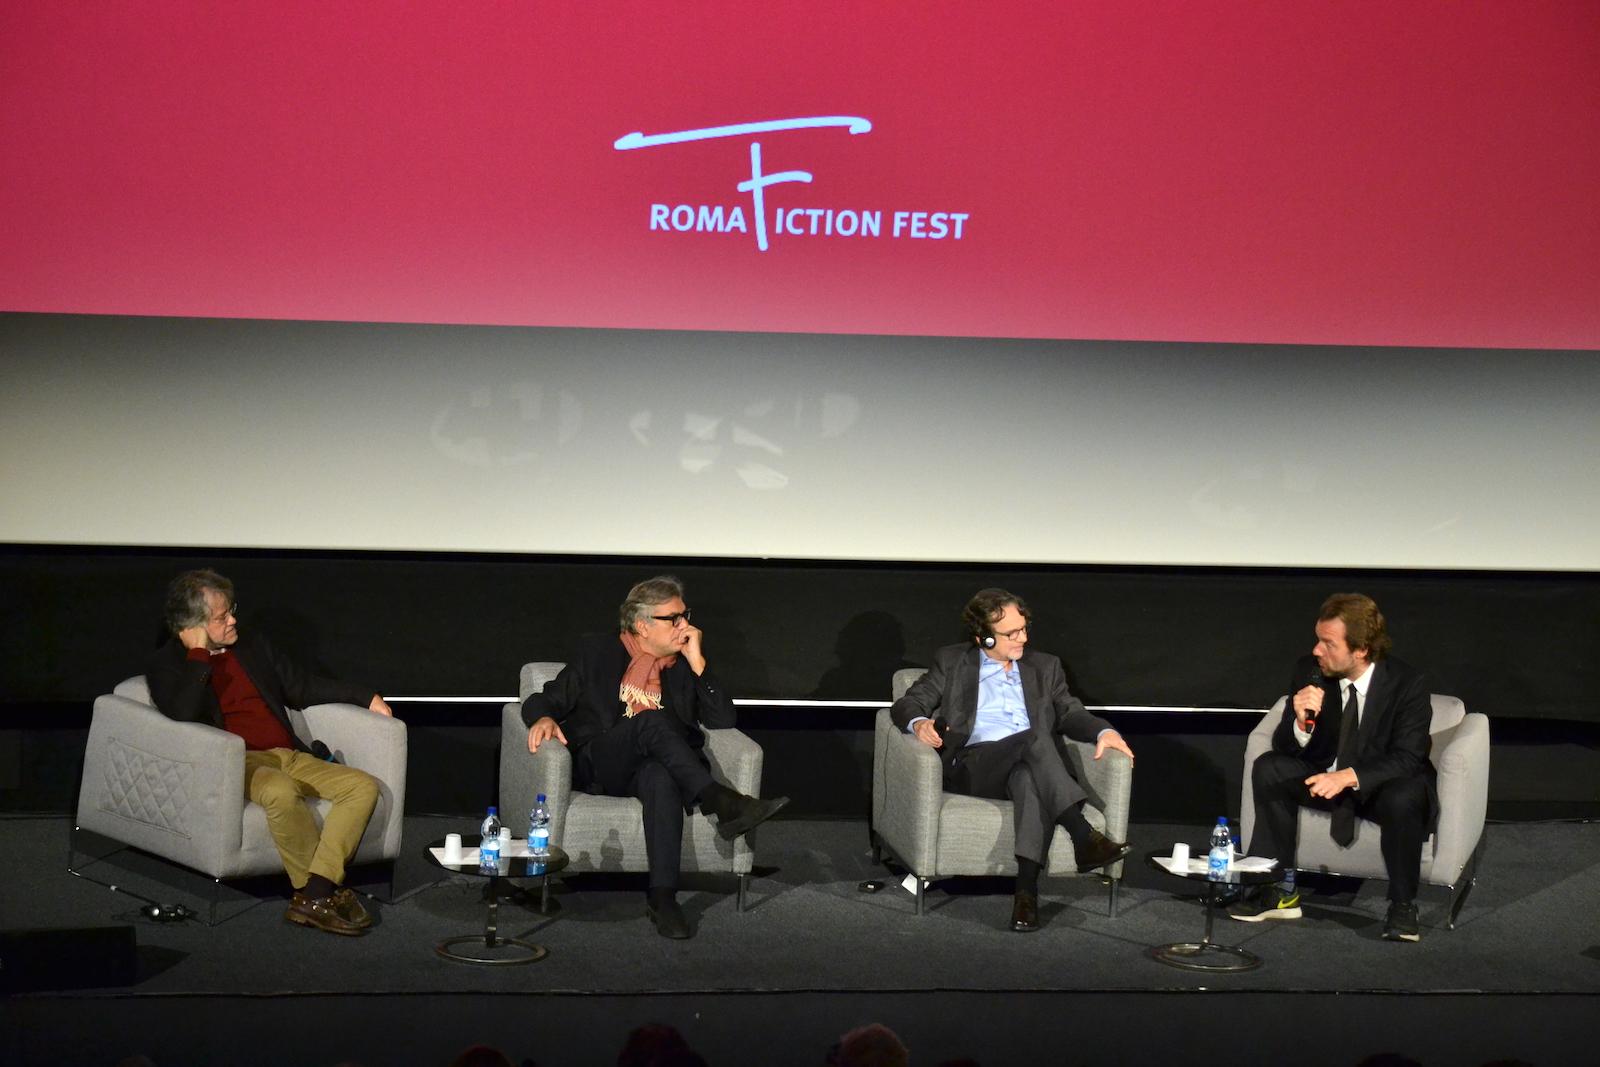 Roma Fiction Fest 2015: Giancarlo de Cataldo, Frank Spotnitz, Andrea Porporati durante la masterclass